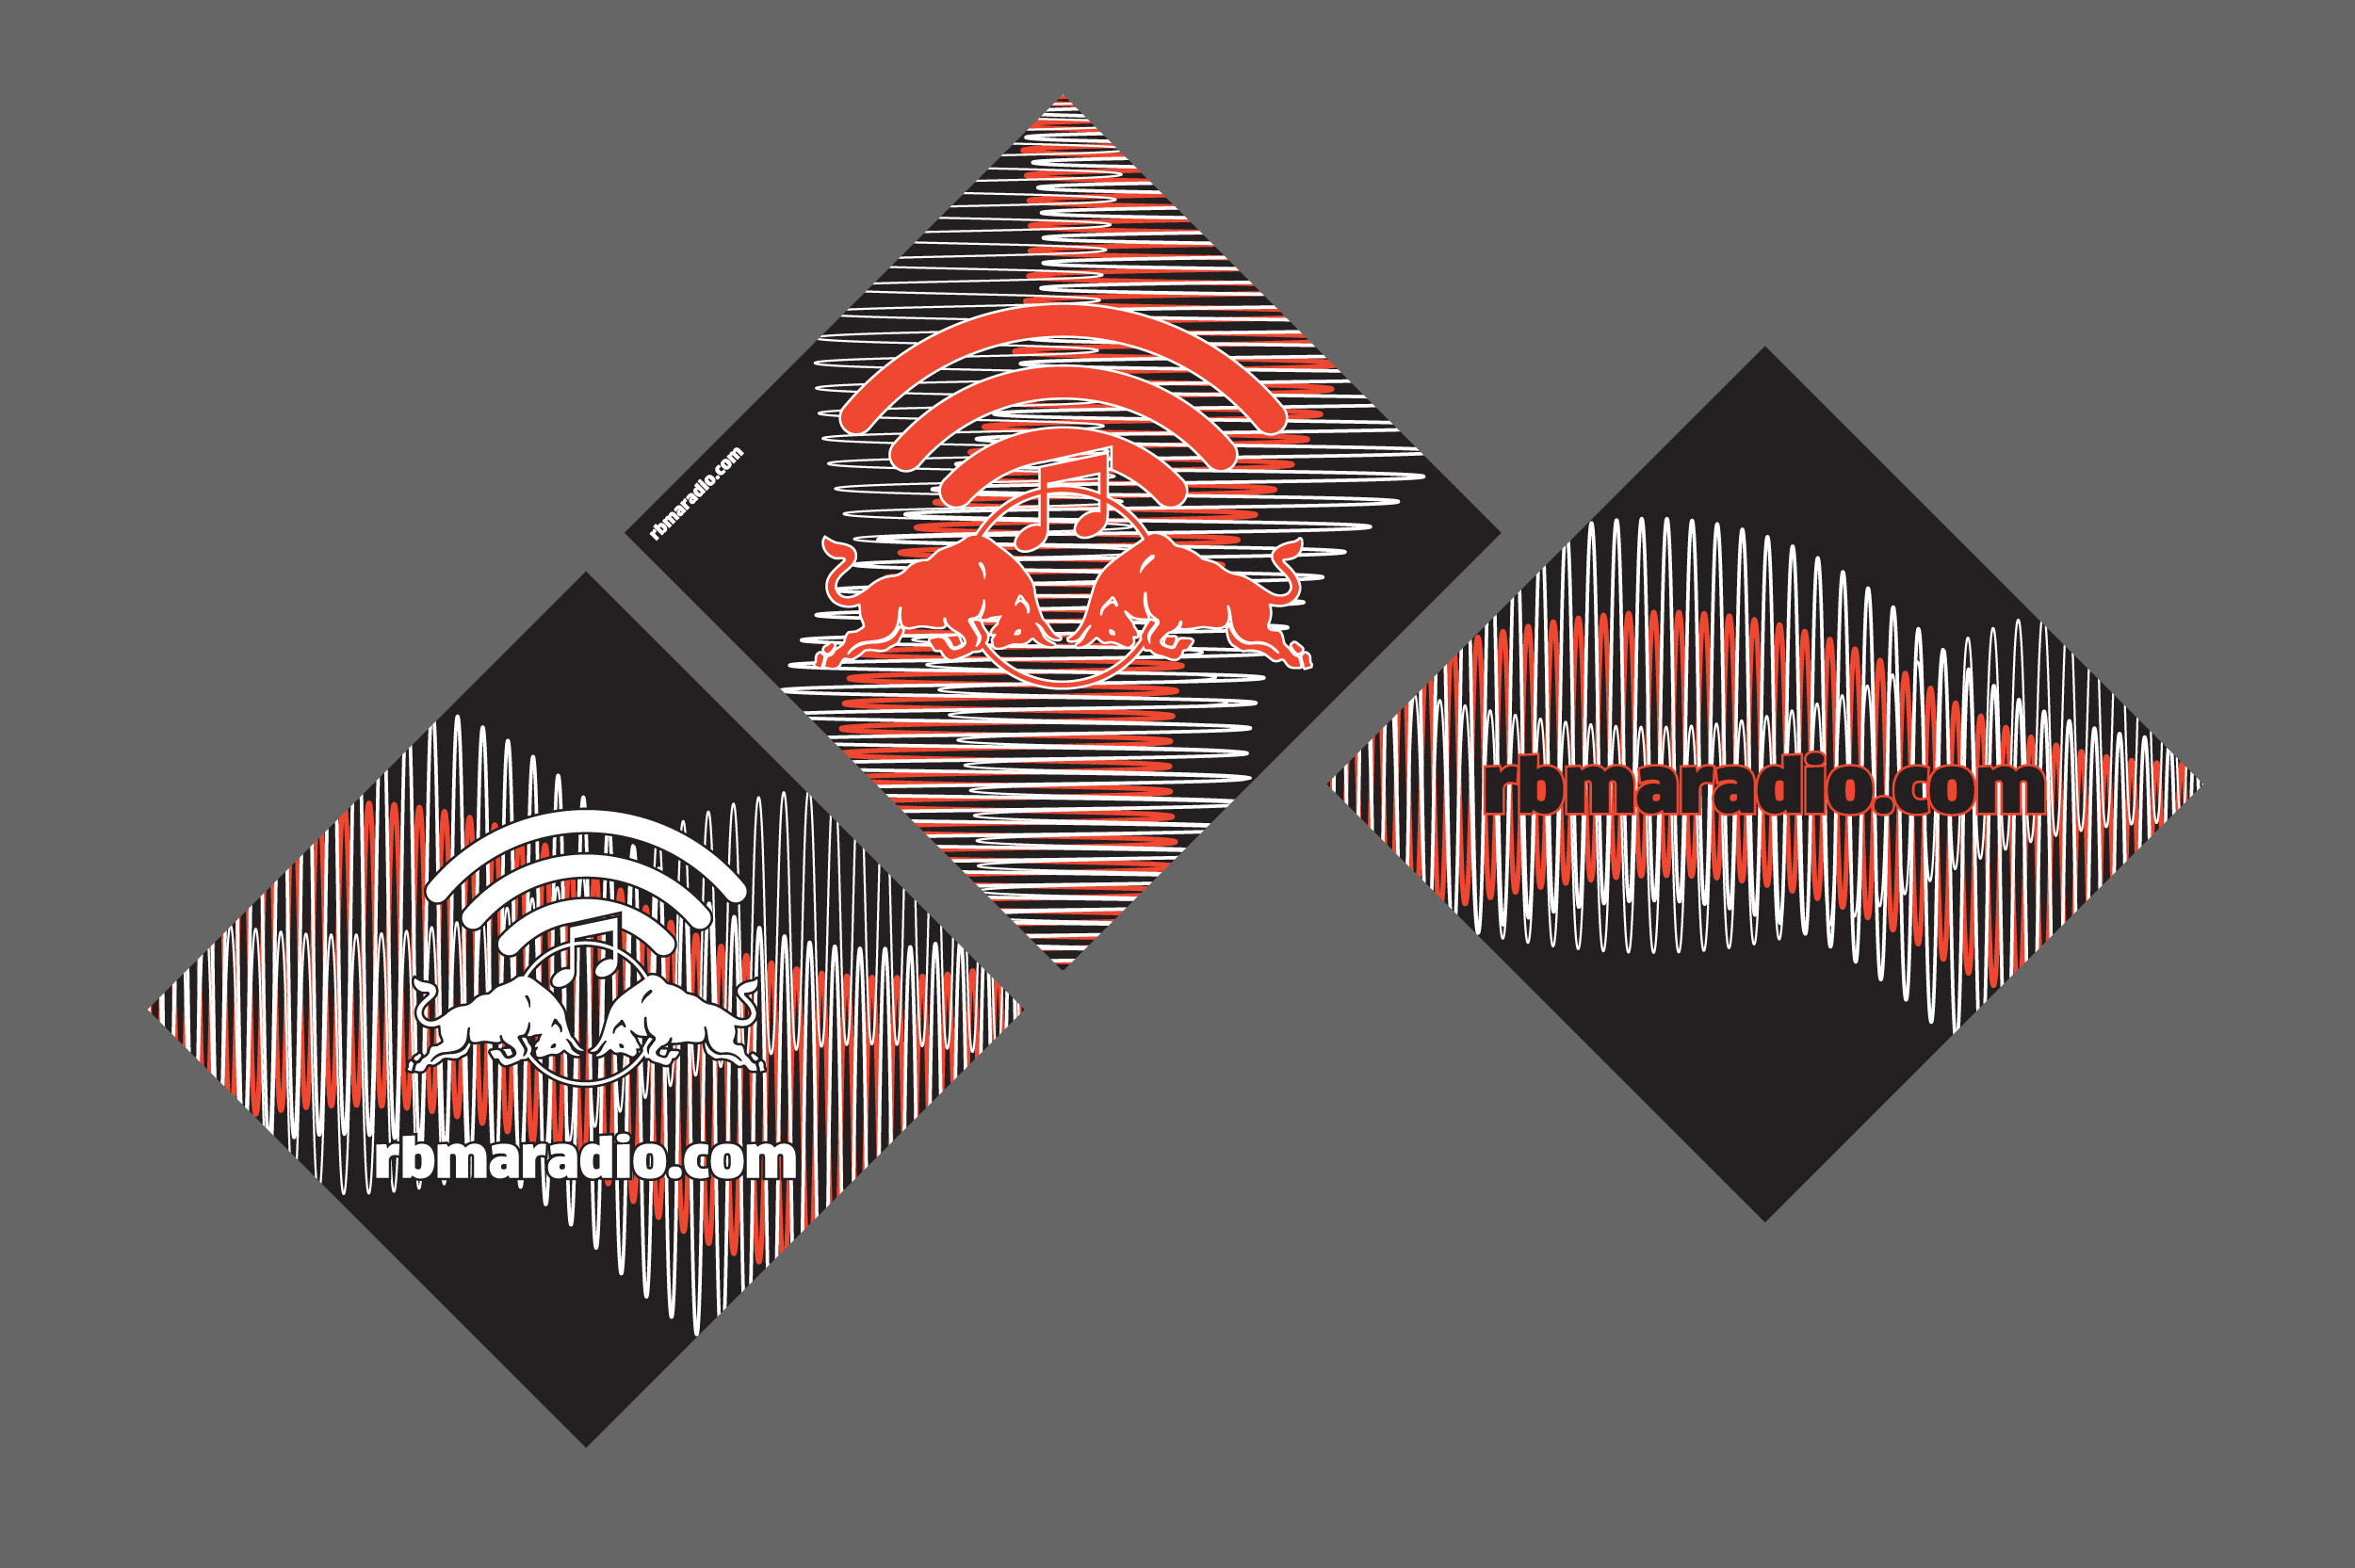 Sticker designs for Red Bull Music Academy Radio